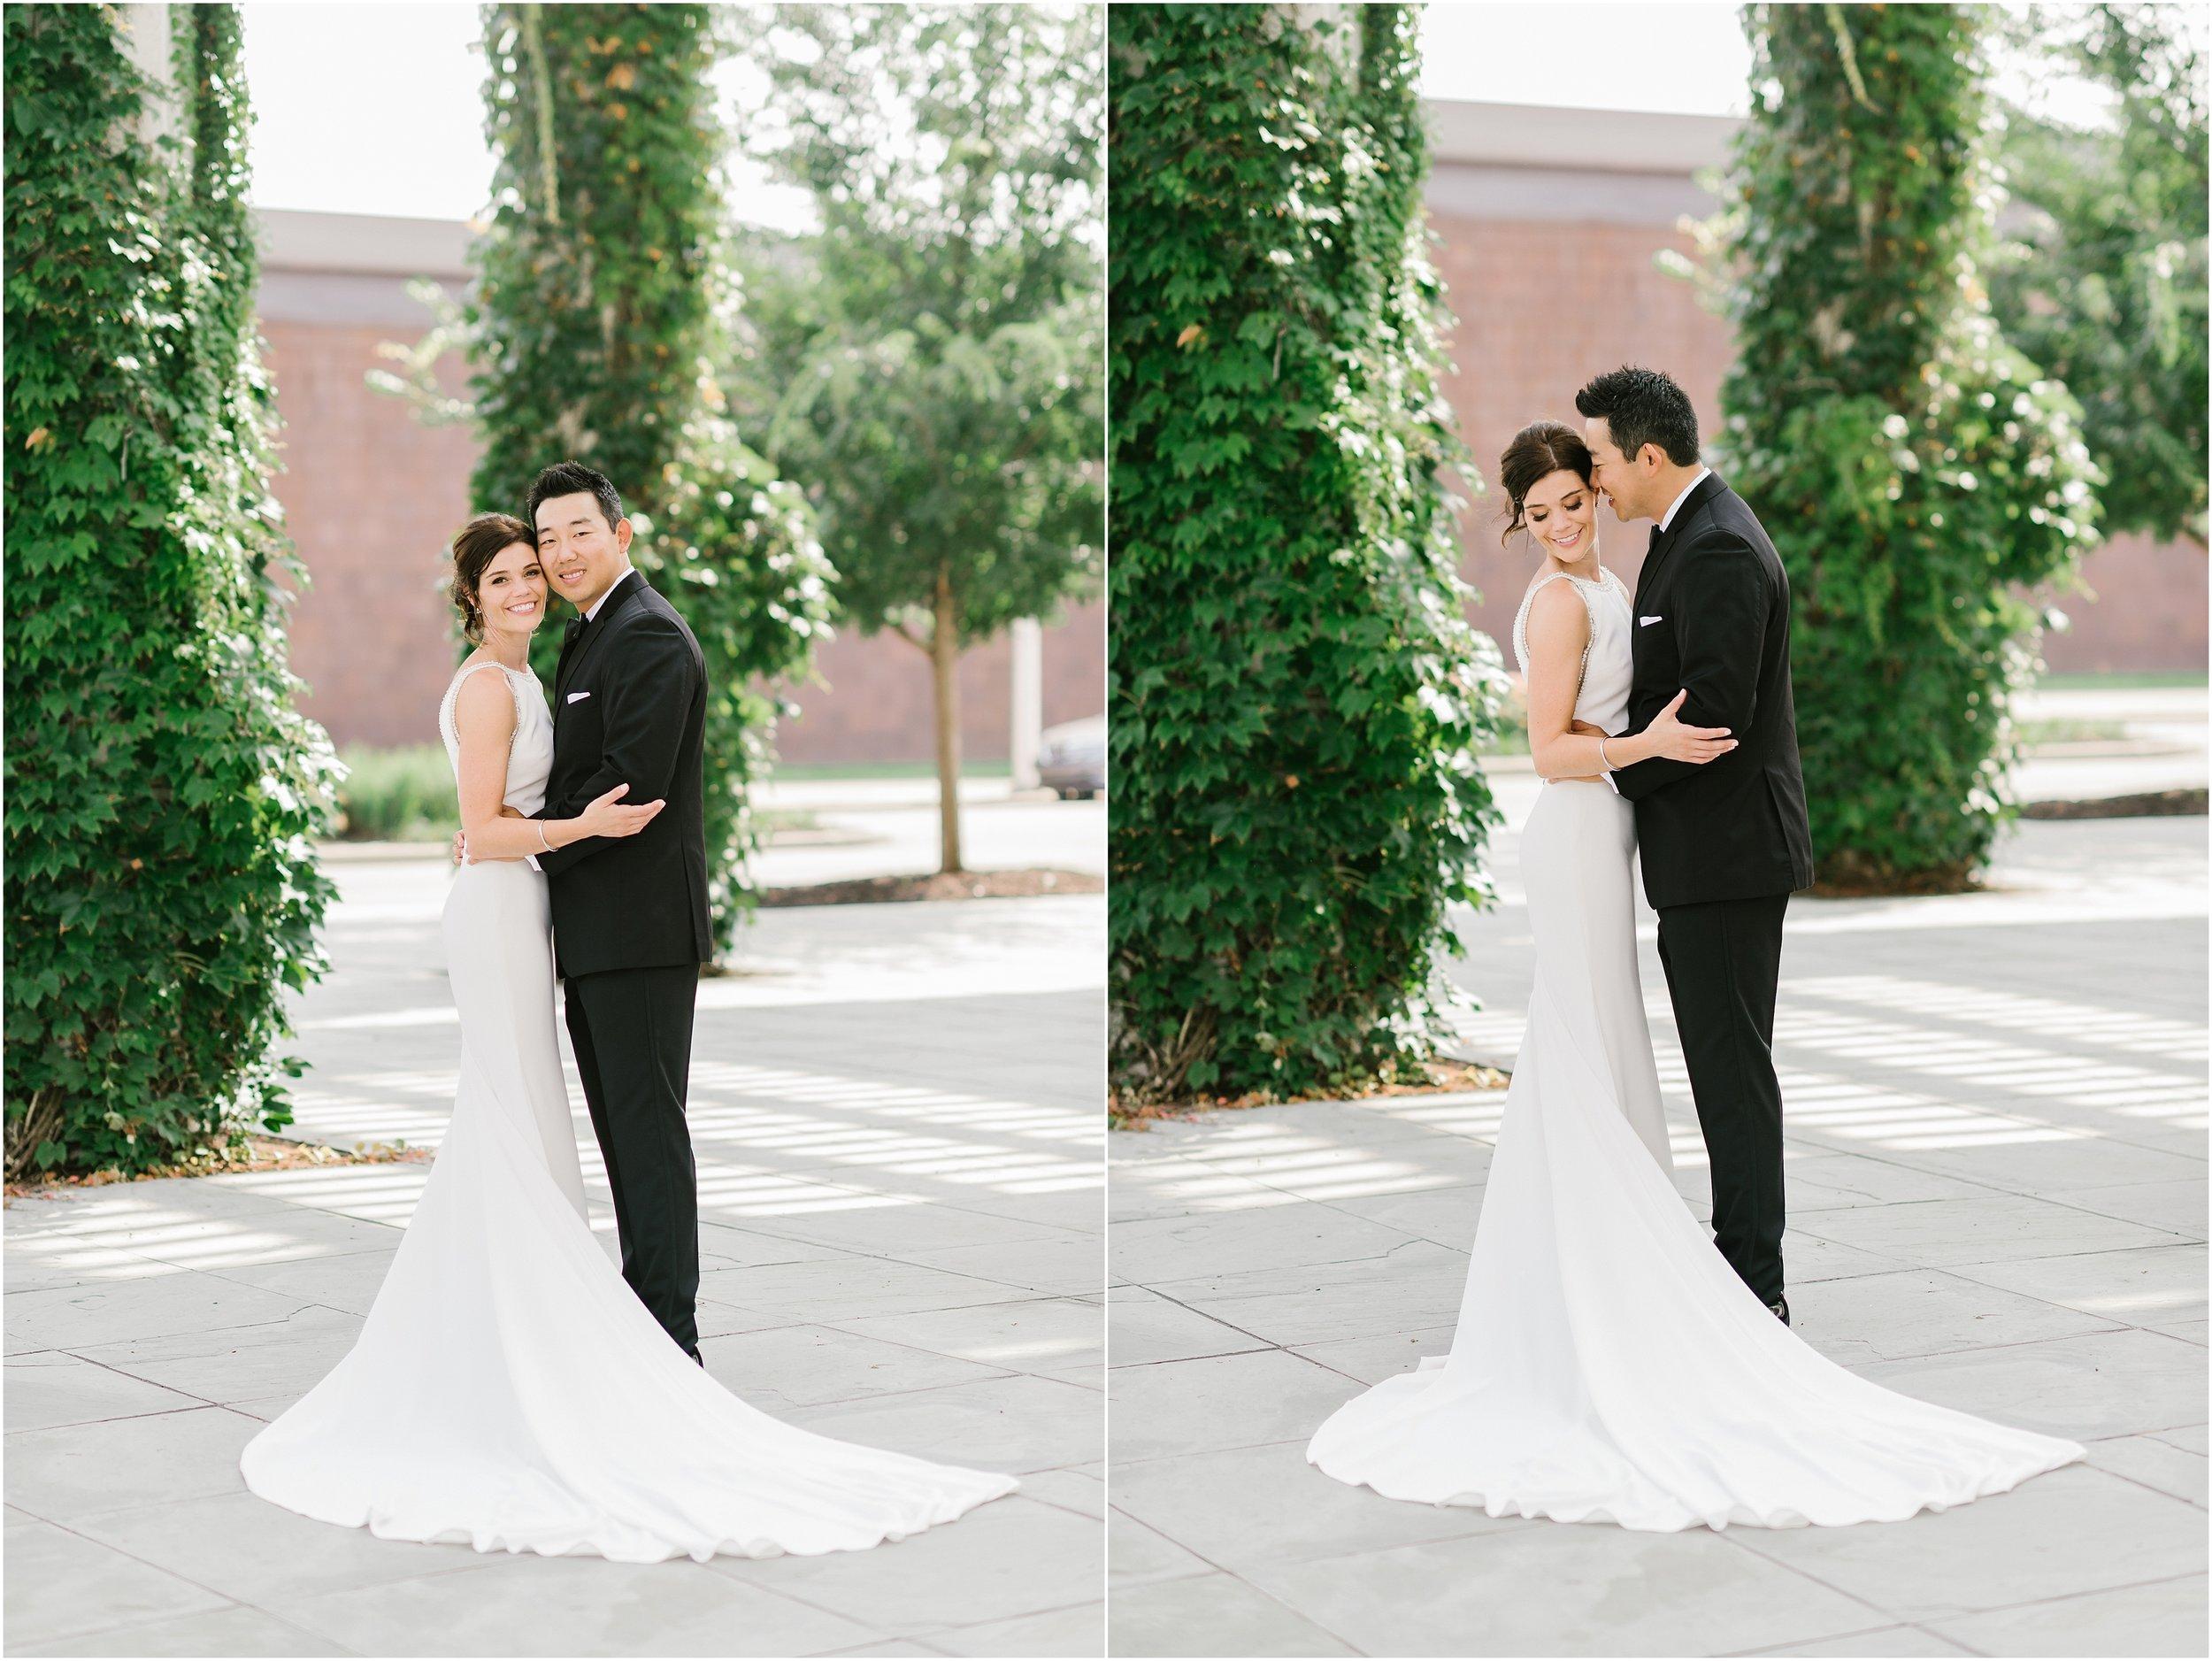 Rebecca_Shehorn_Photography_Indianapolis Wedding Photographer Sycamore at Mallow Run Wedding_9748.jpg